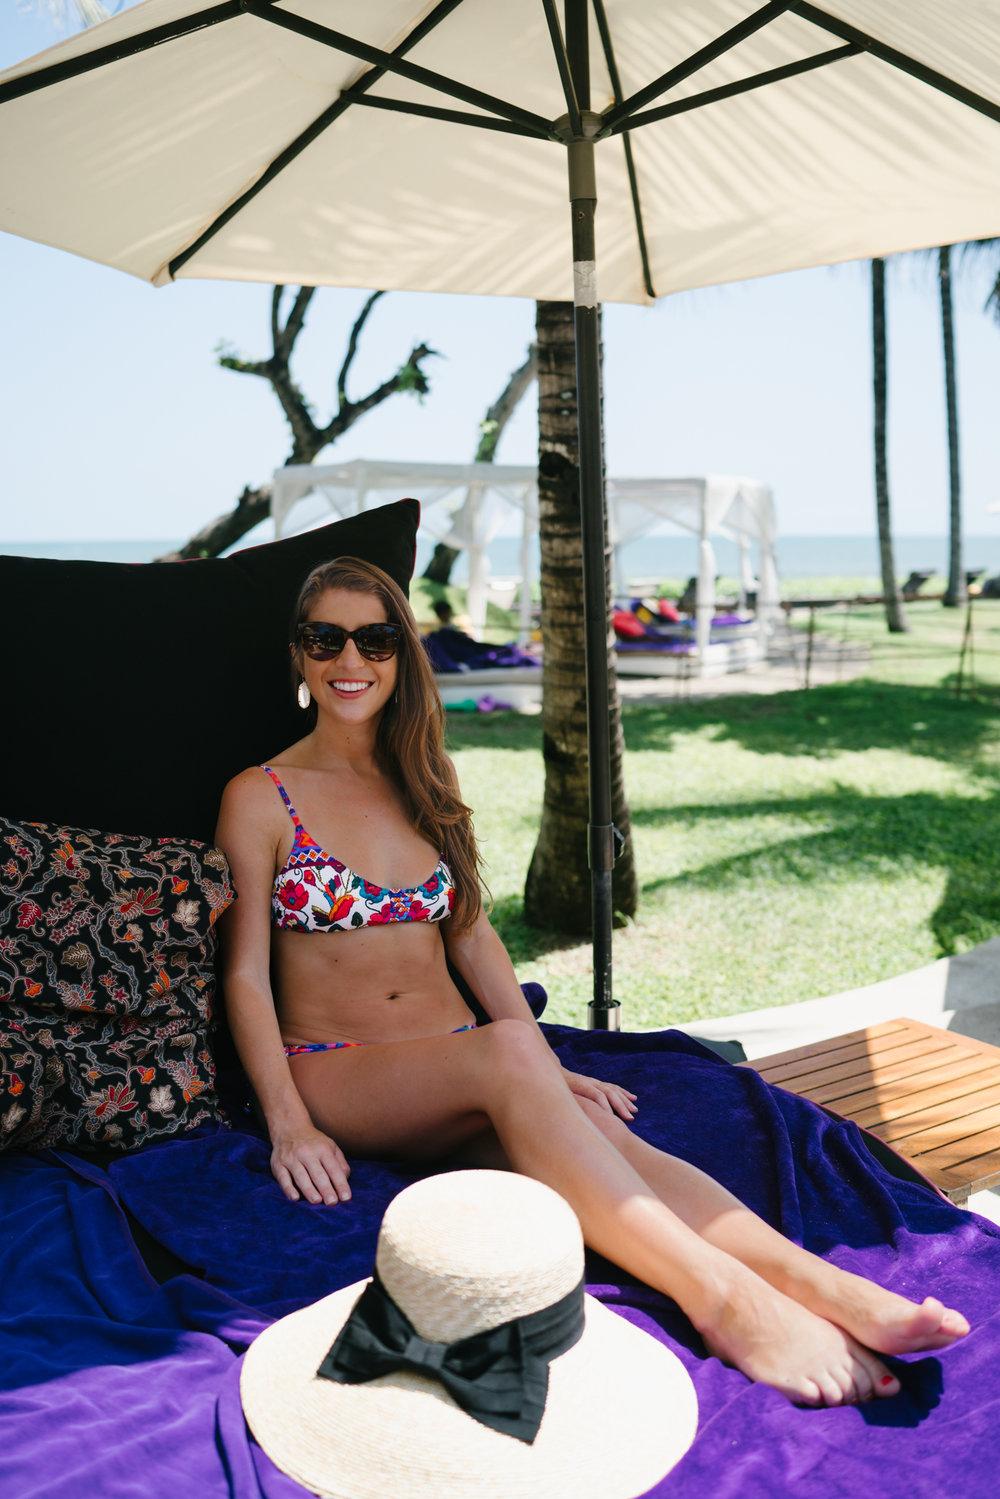 W Bali cabanas